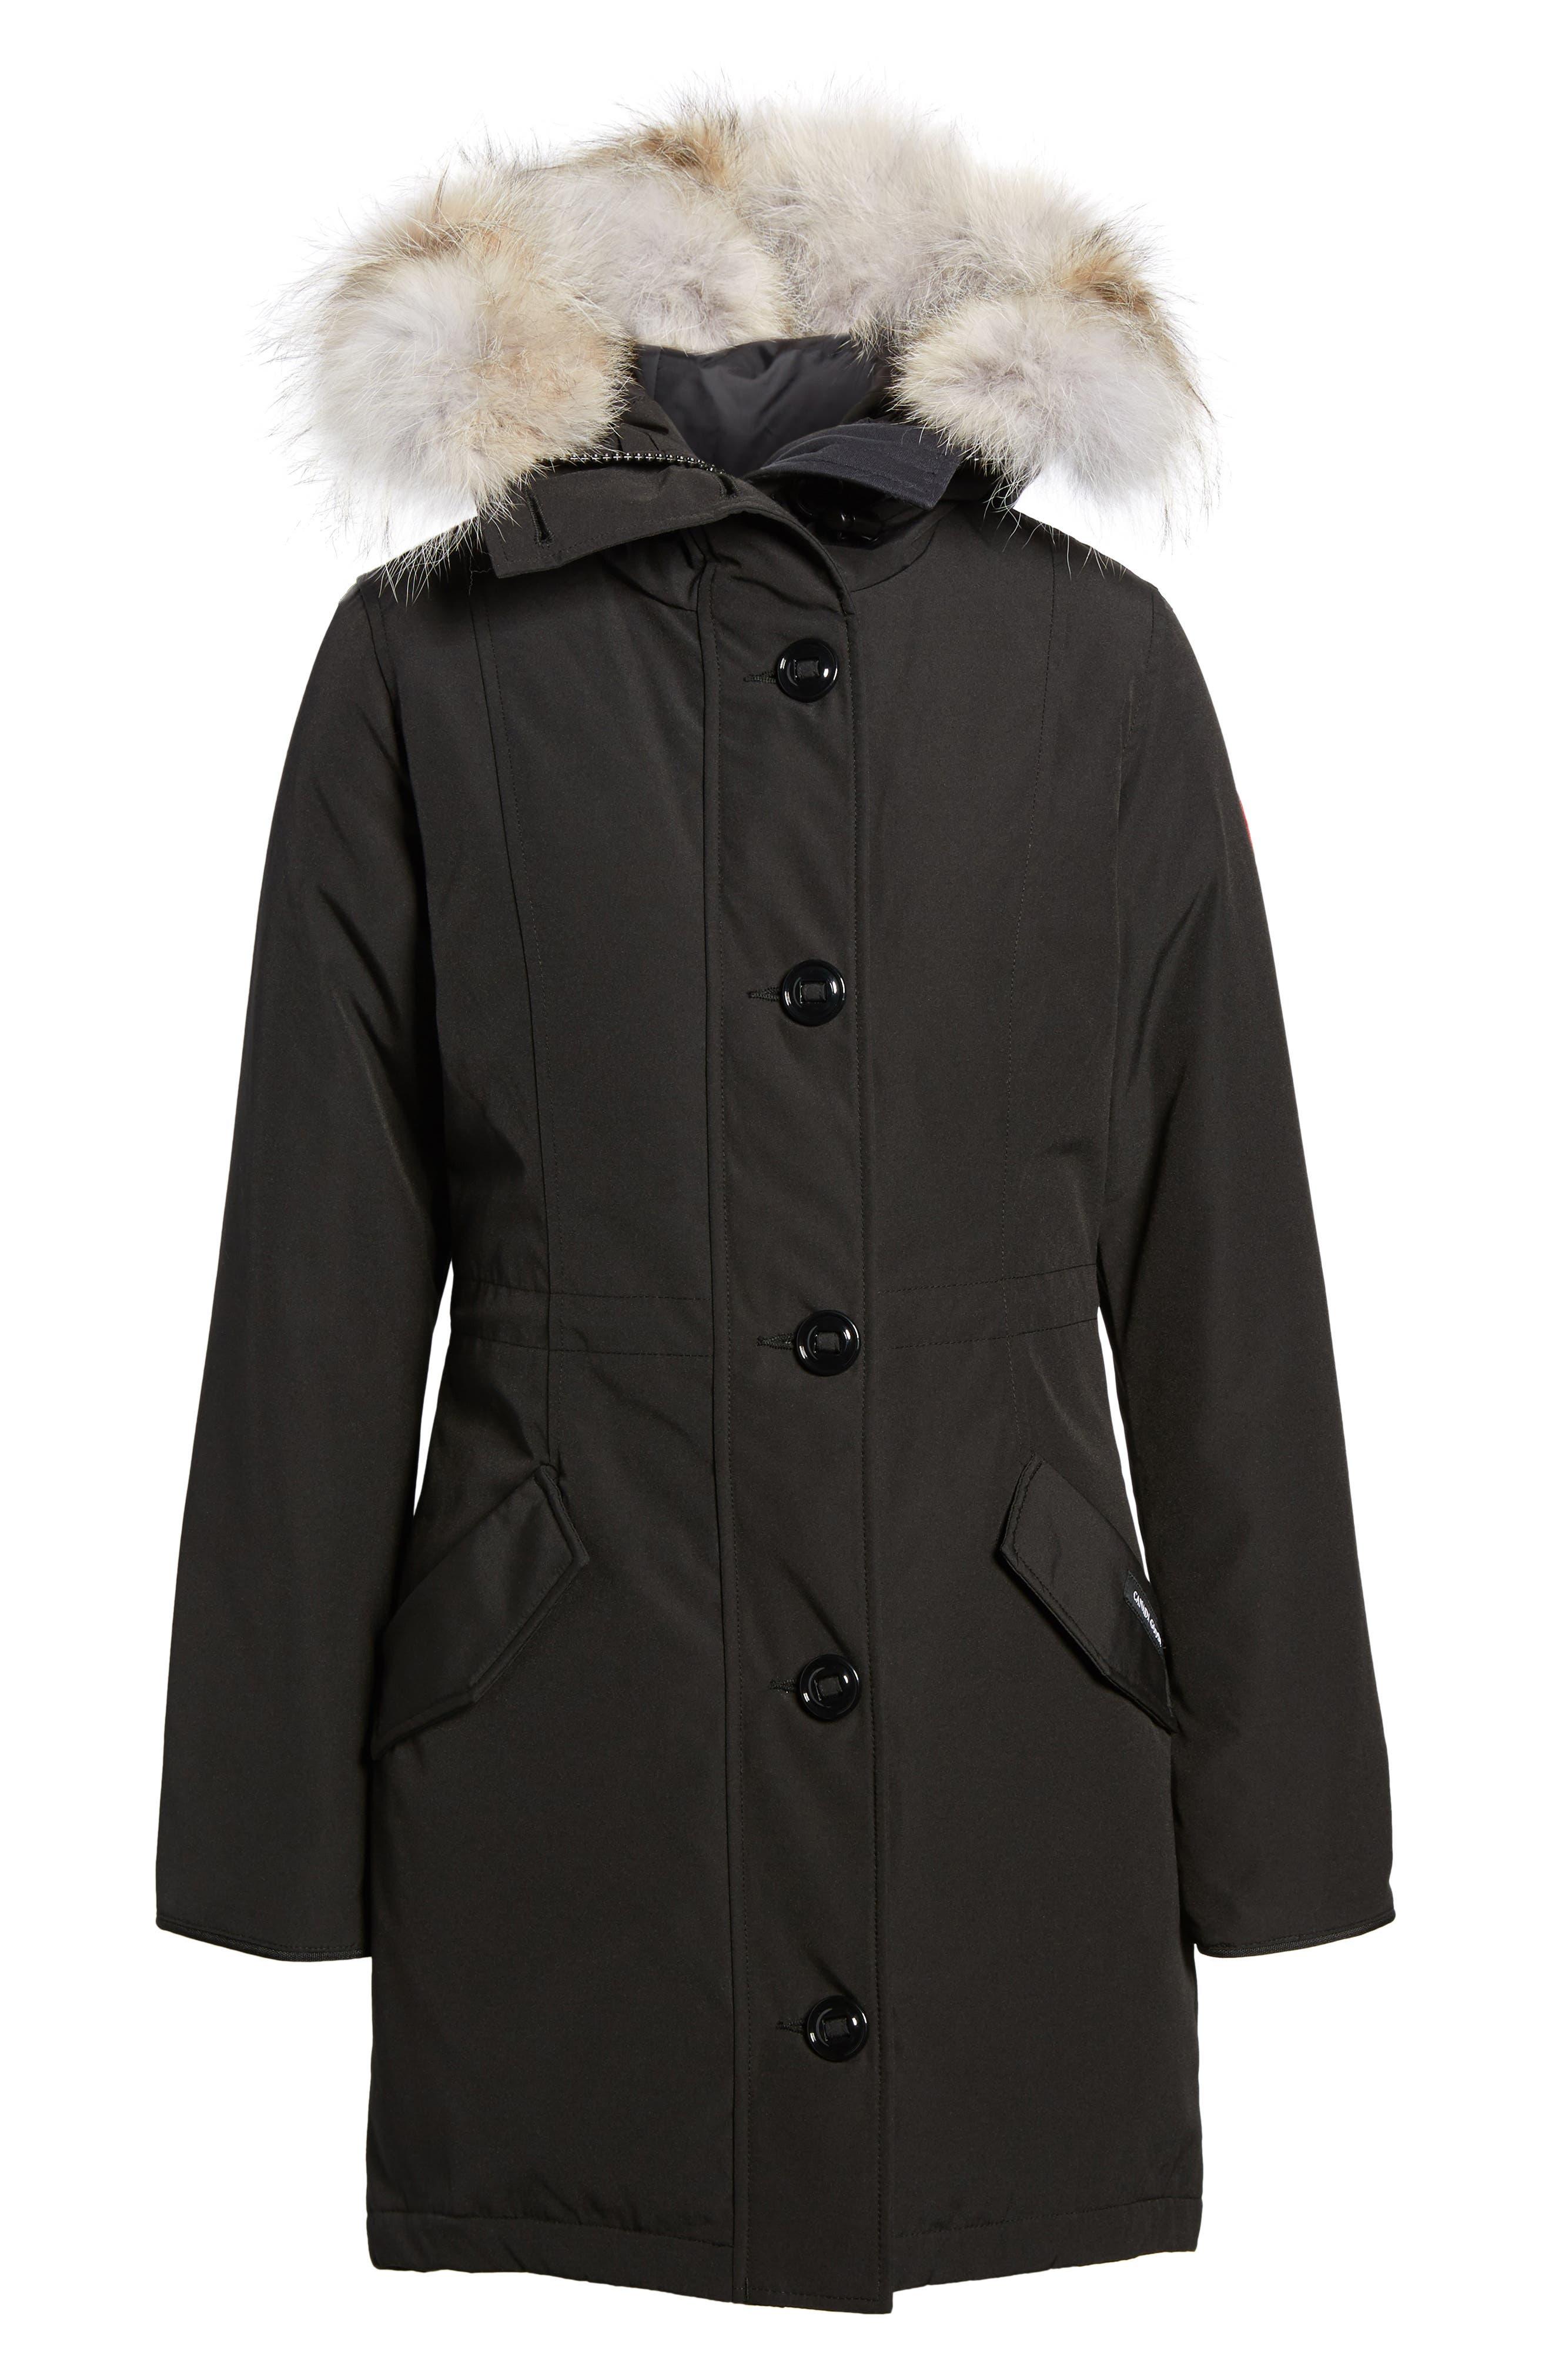 CANADA GOOSE, Rossclair Genuine Coyote Fur Trim Down Parka, Alternate thumbnail 2, color, BLACK